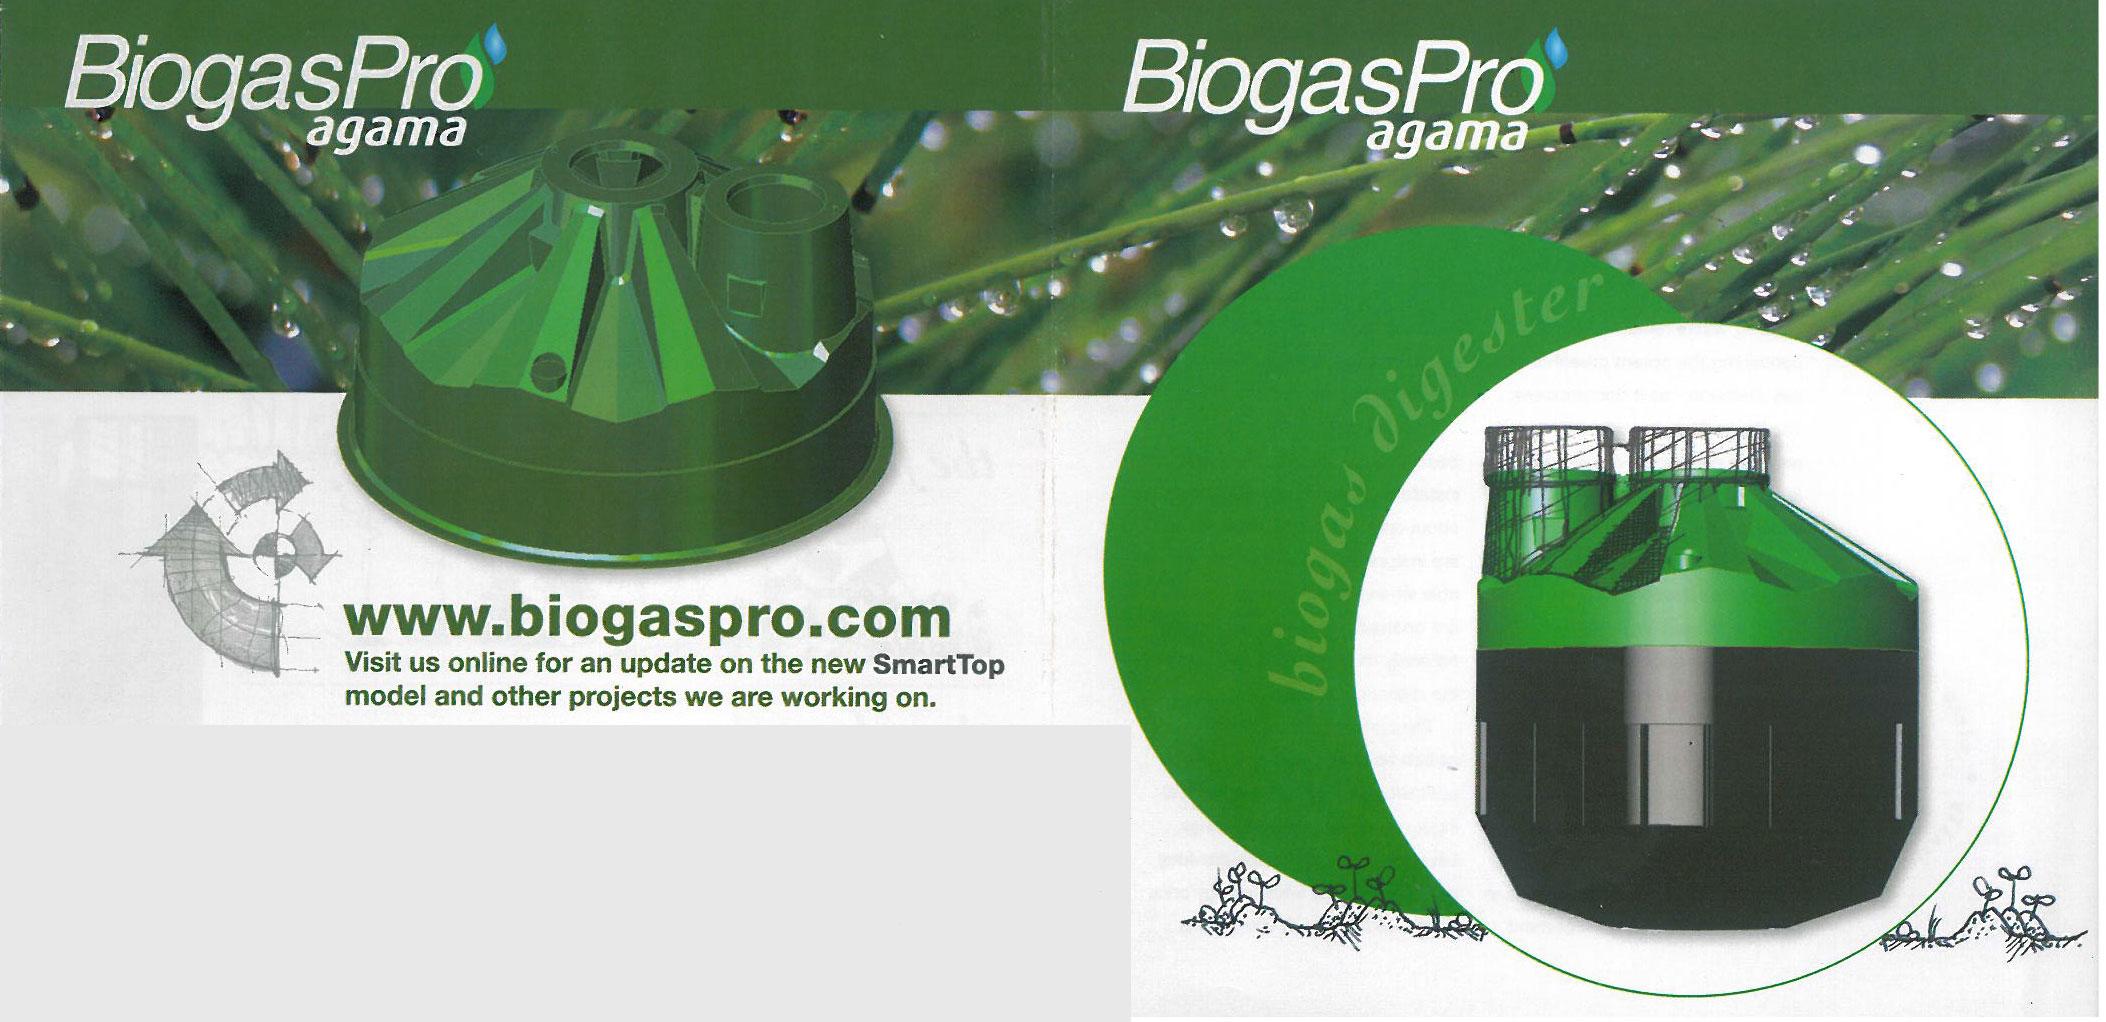 Products Biogas Digester Eden Developments www.edendevelopments.co.za